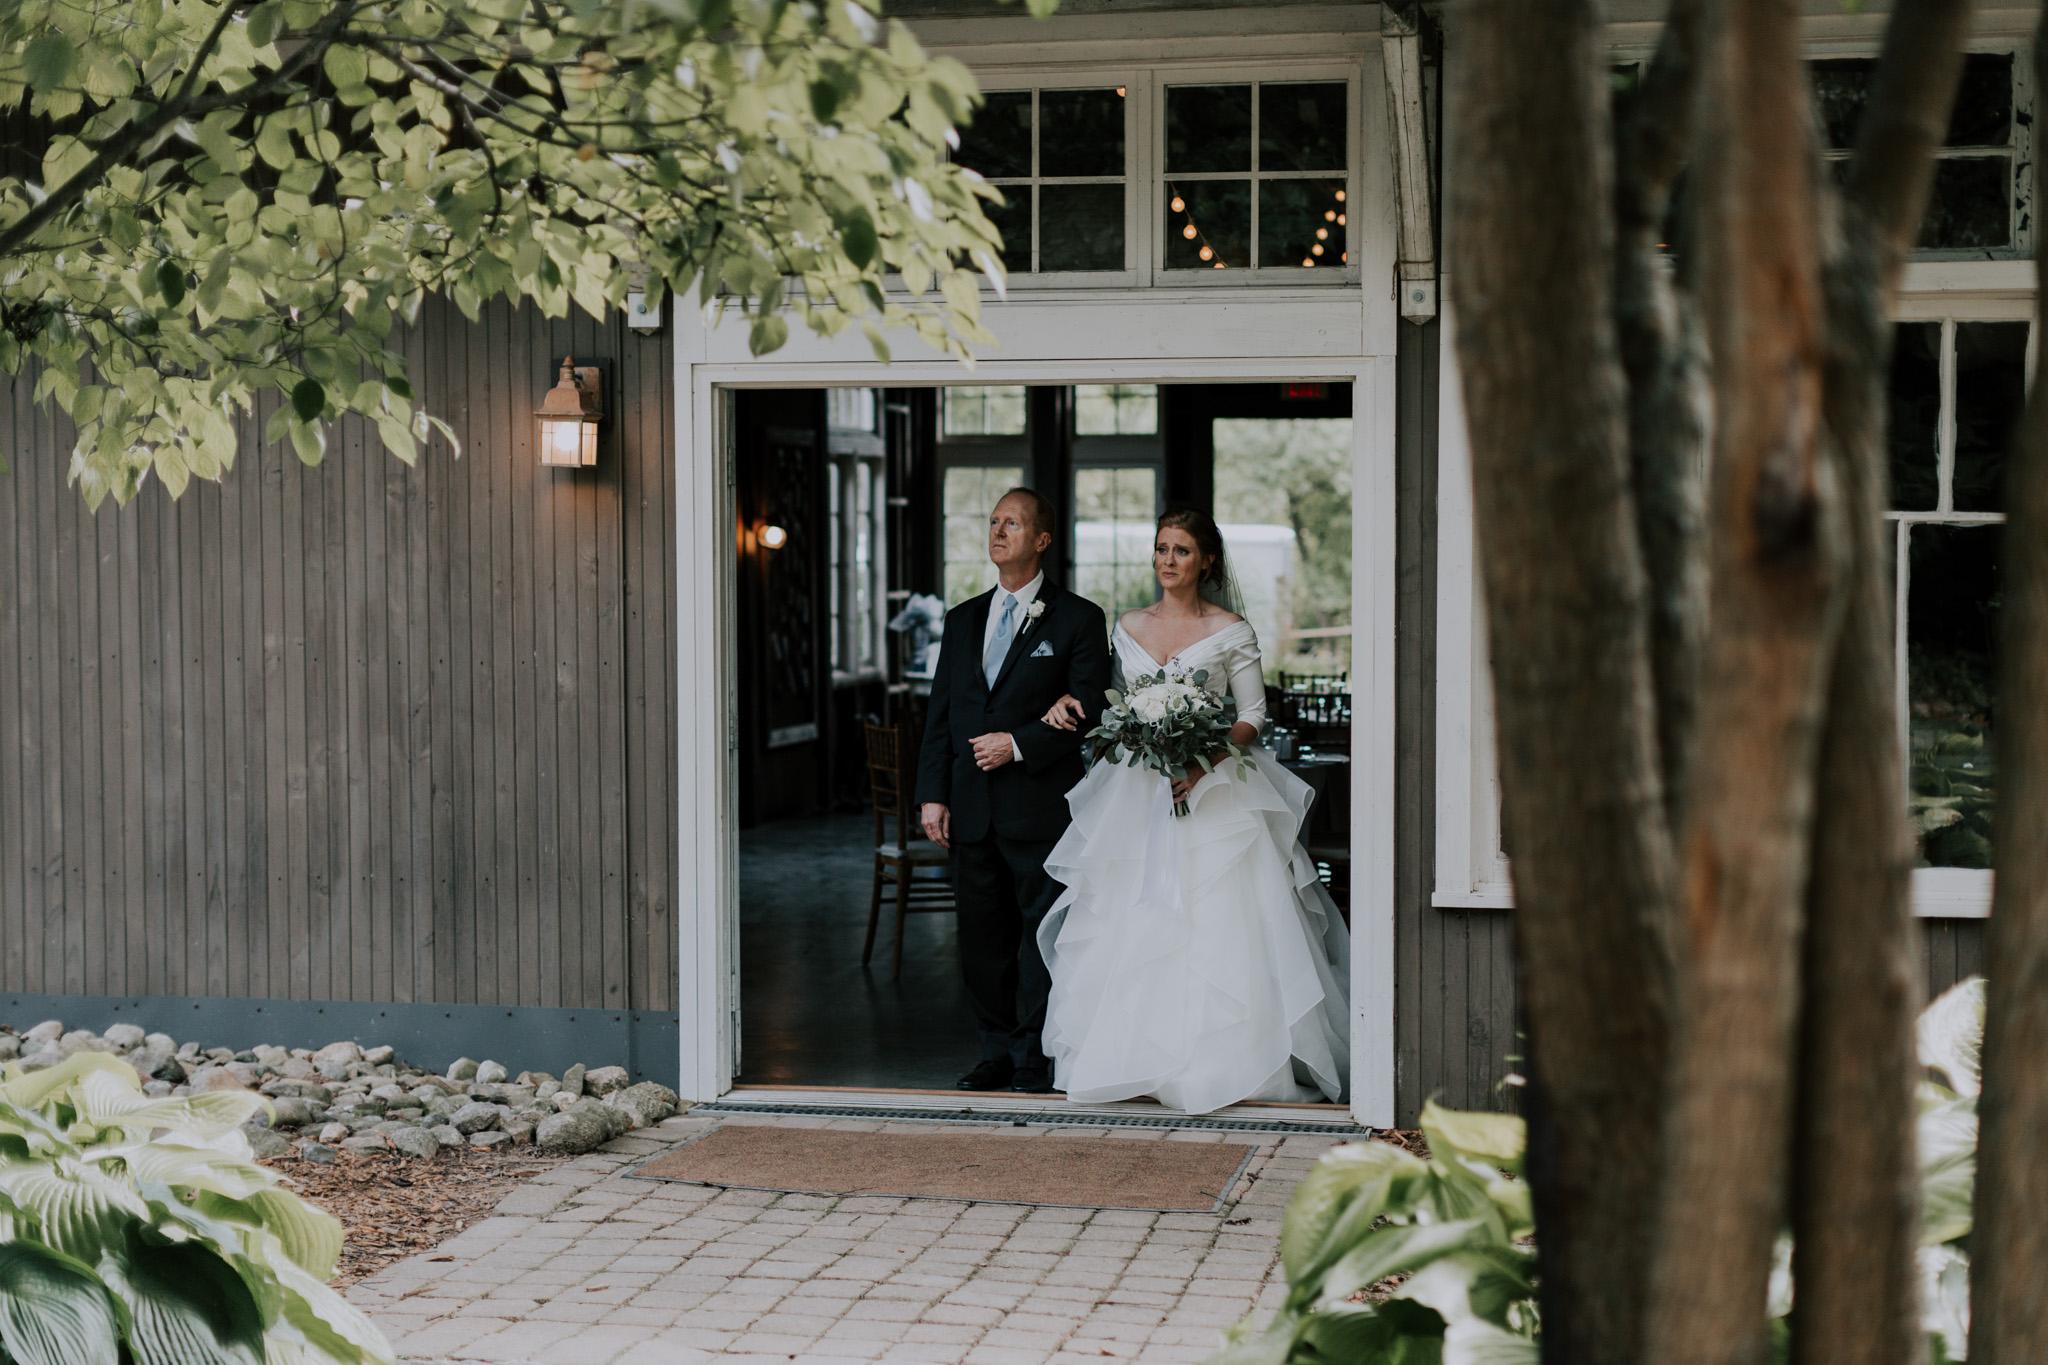 MillCreek-Wilde-Wedding-Barn-Michigan-Eliza-Eric-Vafa-Photo615.jpg